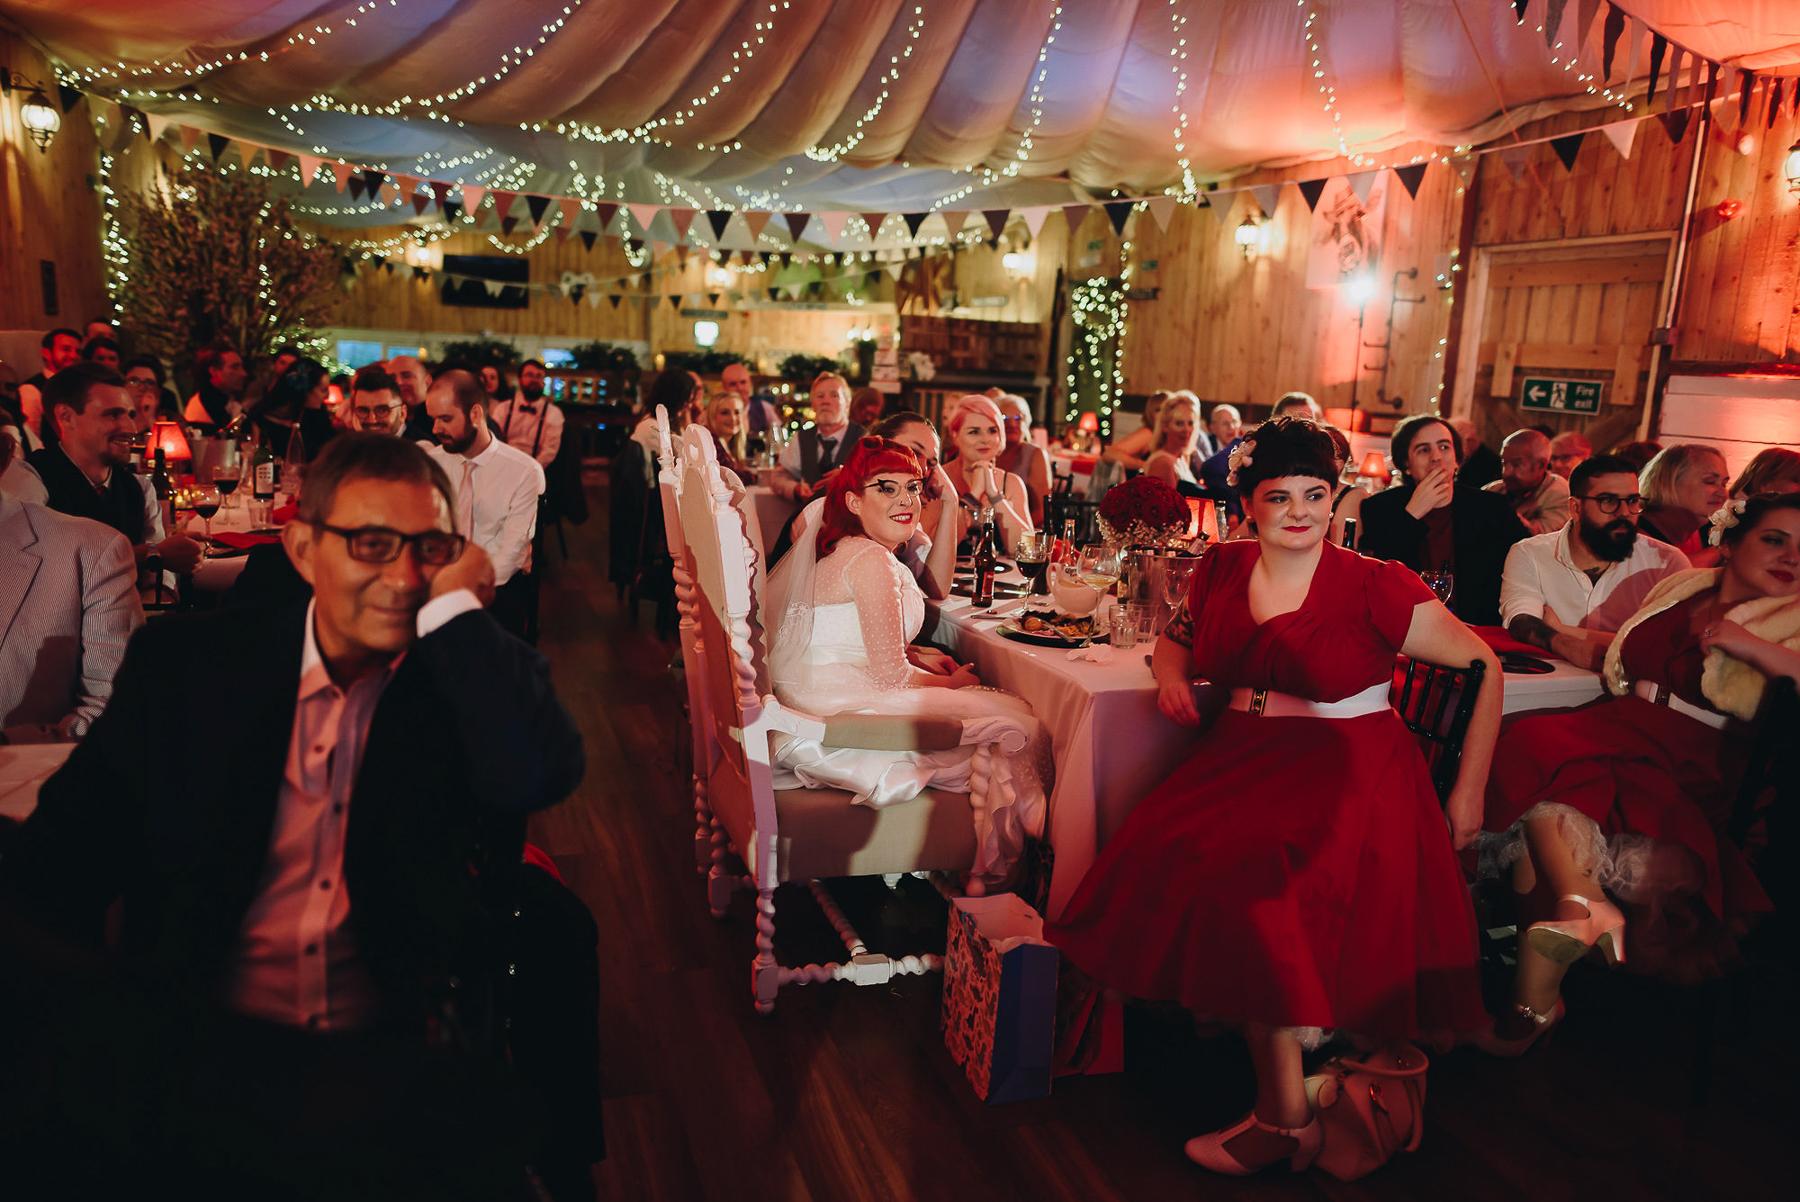 Wellbeing_Farm_Wedding_Photography_The_Pin-Up_Bride_Lara_Shaun-136.jpg